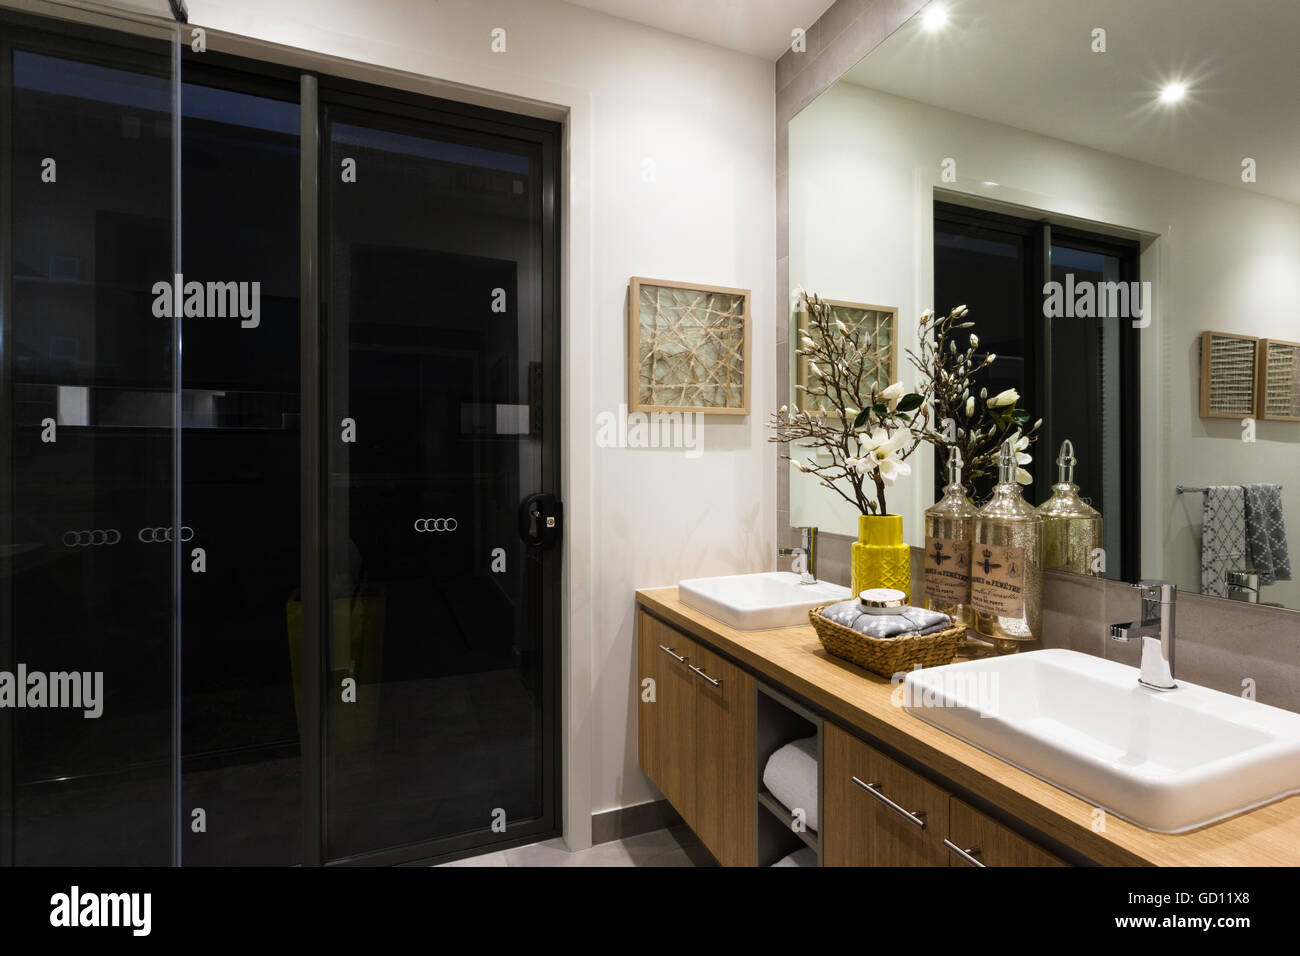 Luxury washroom with lights on at night next to a black glass door luxury washroom with lights on at night next to a black glass door mozeypictures Choice Image